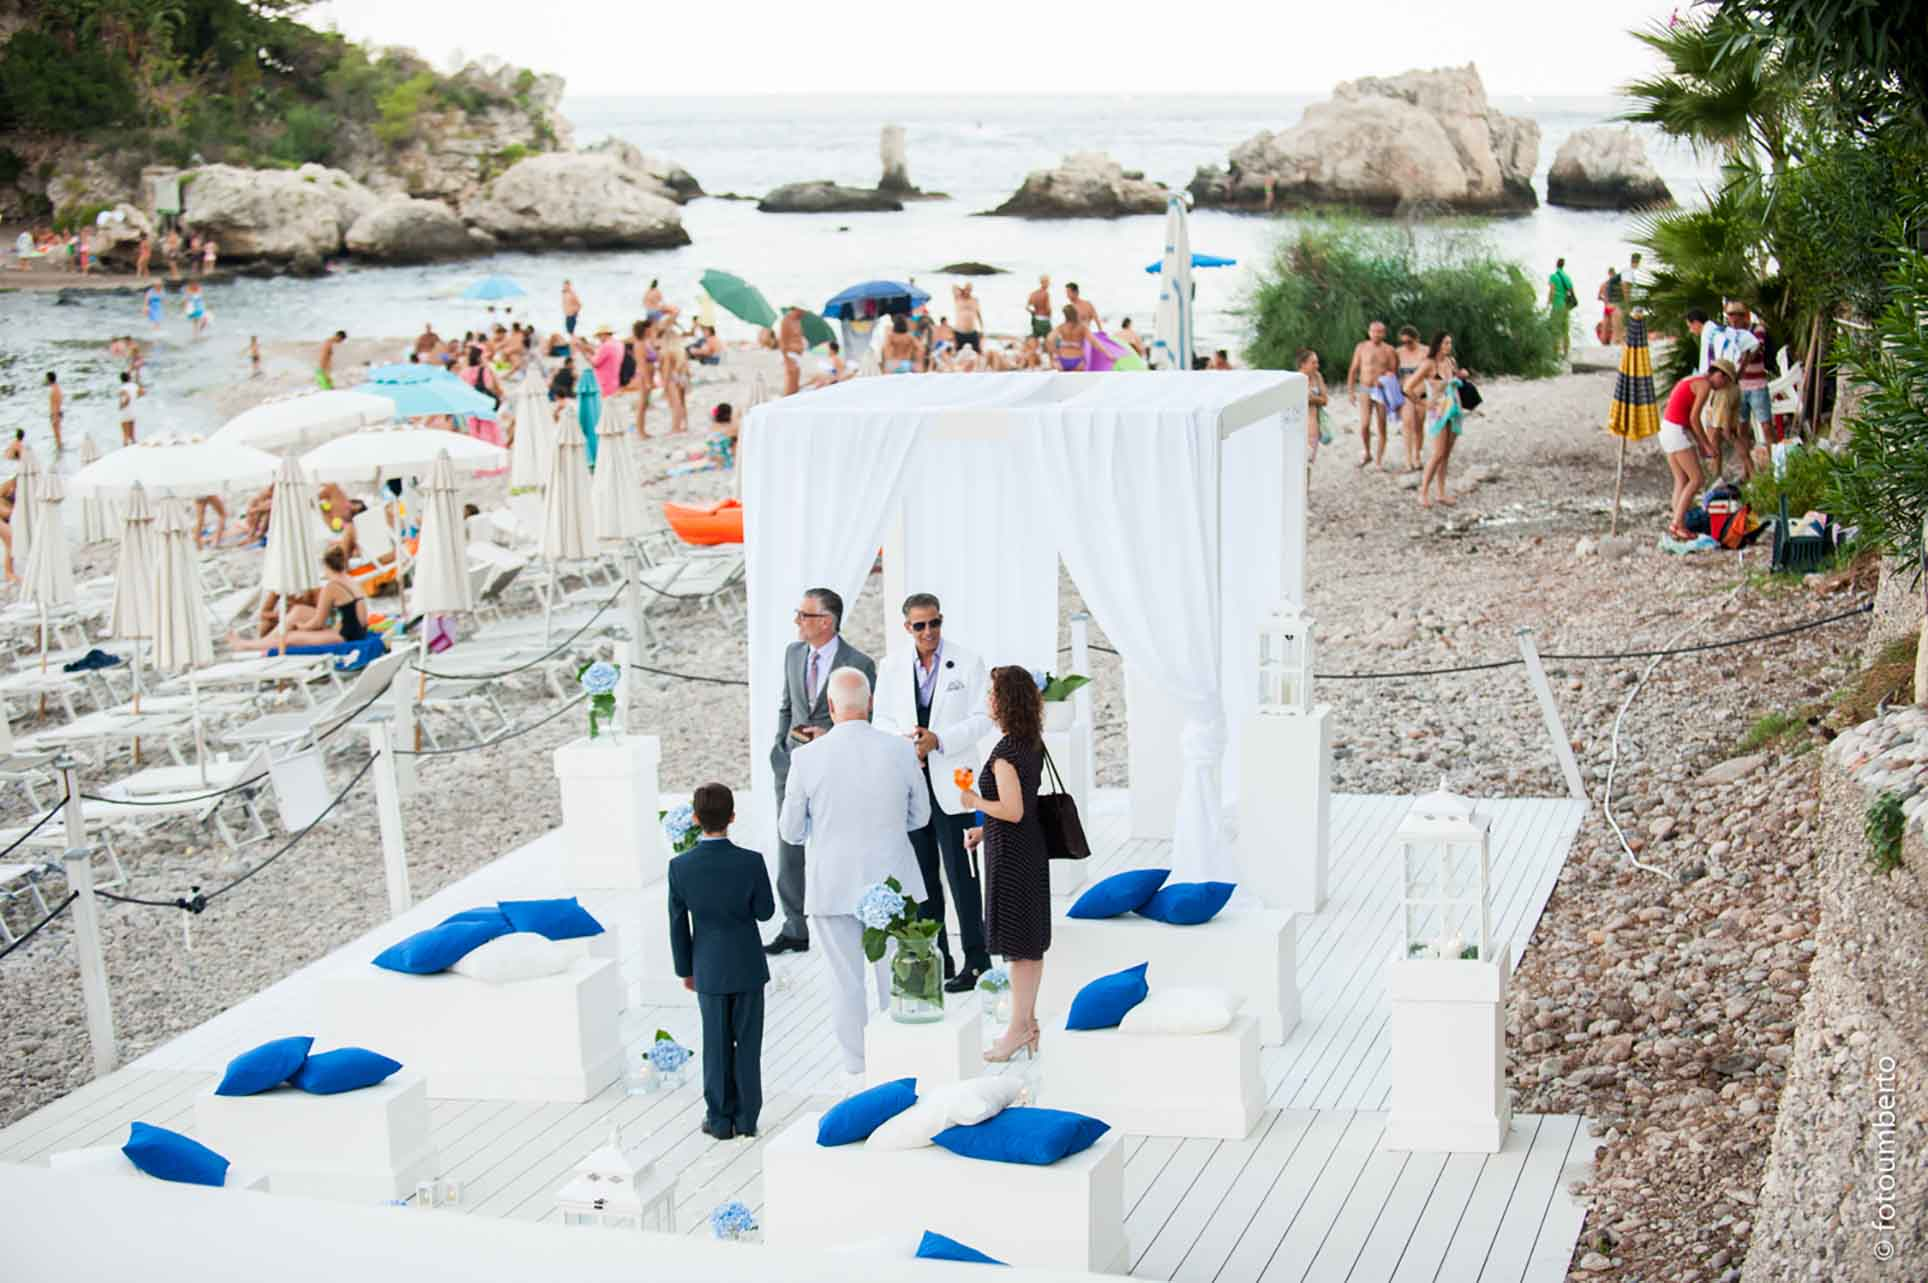 la plage resort (17)